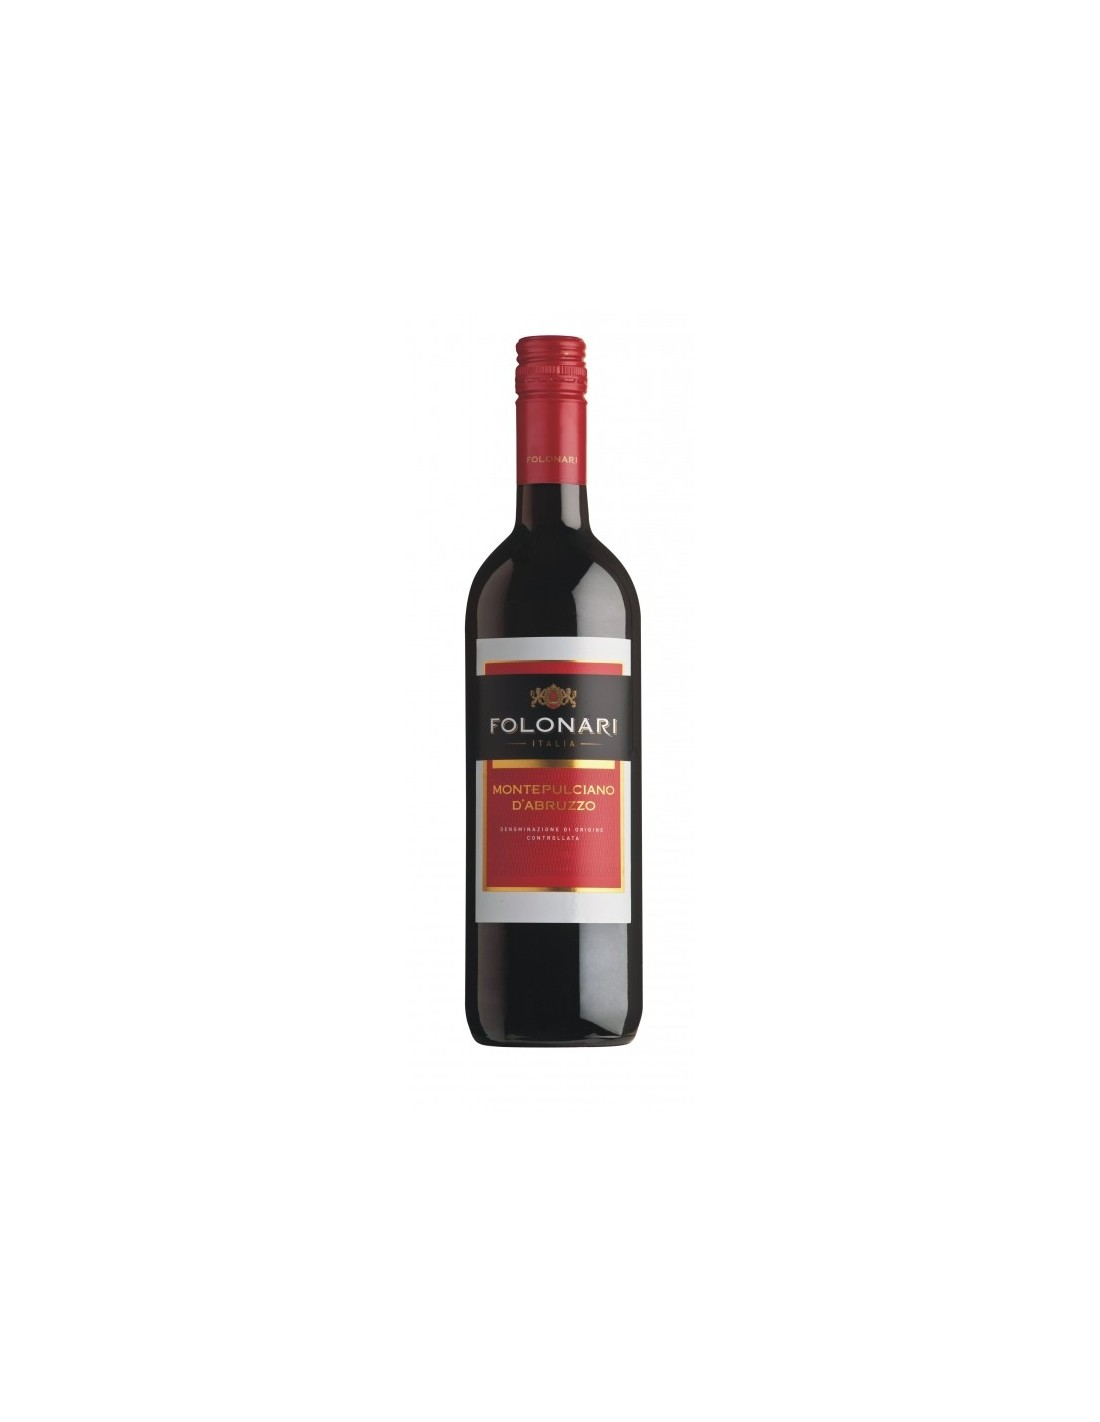 Vin rosu sec, Cupaj, Folonari Montepulciano d'Abruzzo, 0.75L, 12.5% alc., Italia